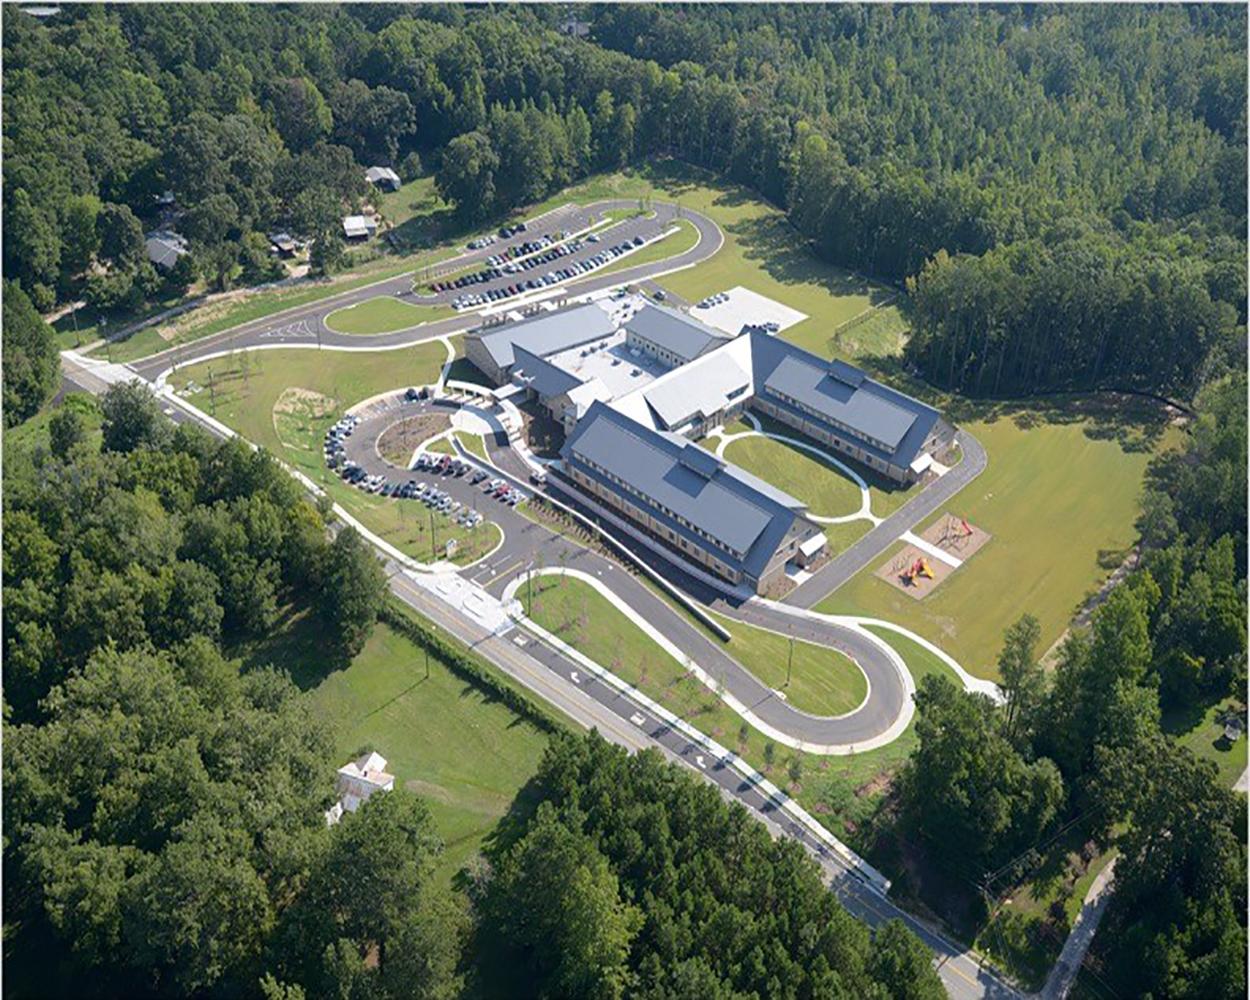 Wolf Creek Elementary School Aerial | Cooper & Company General Contractors